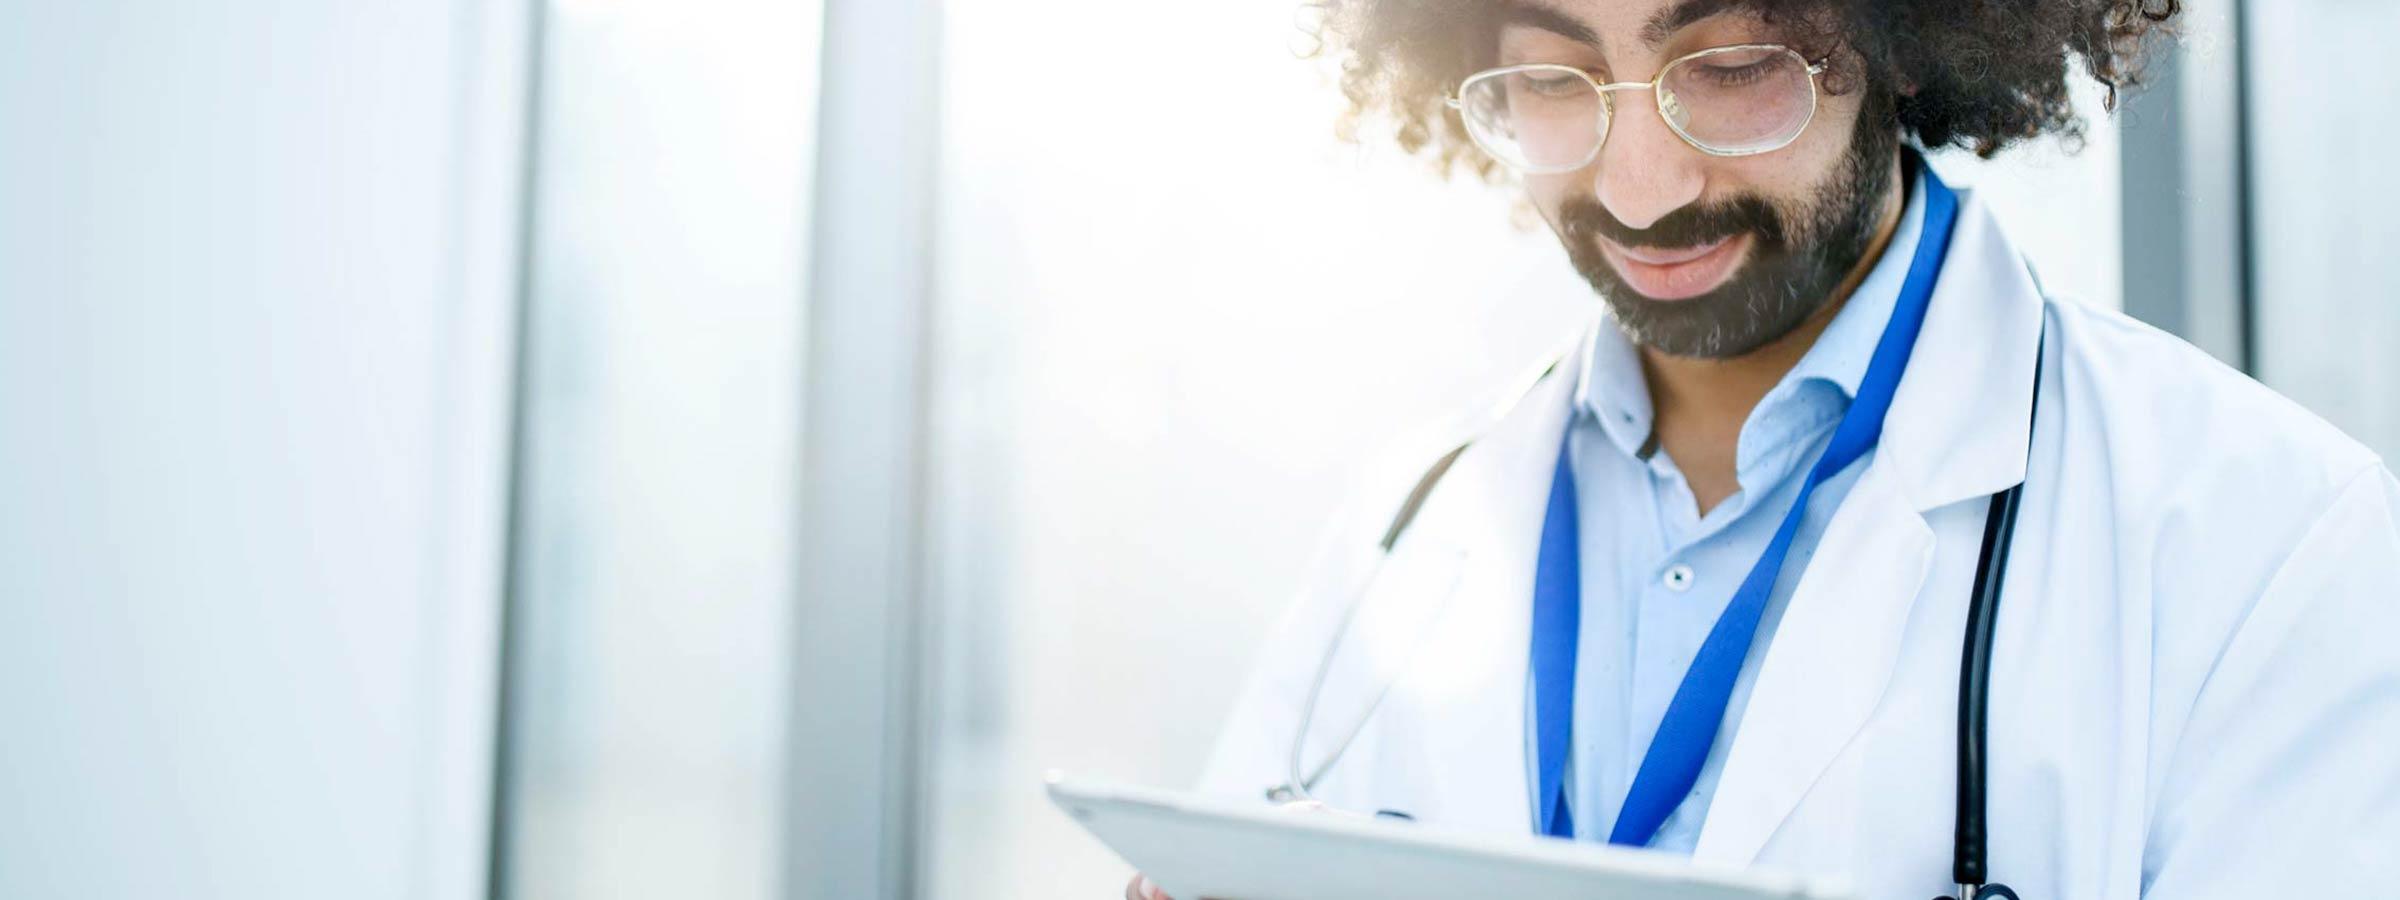 Meet Your Radiology Hub